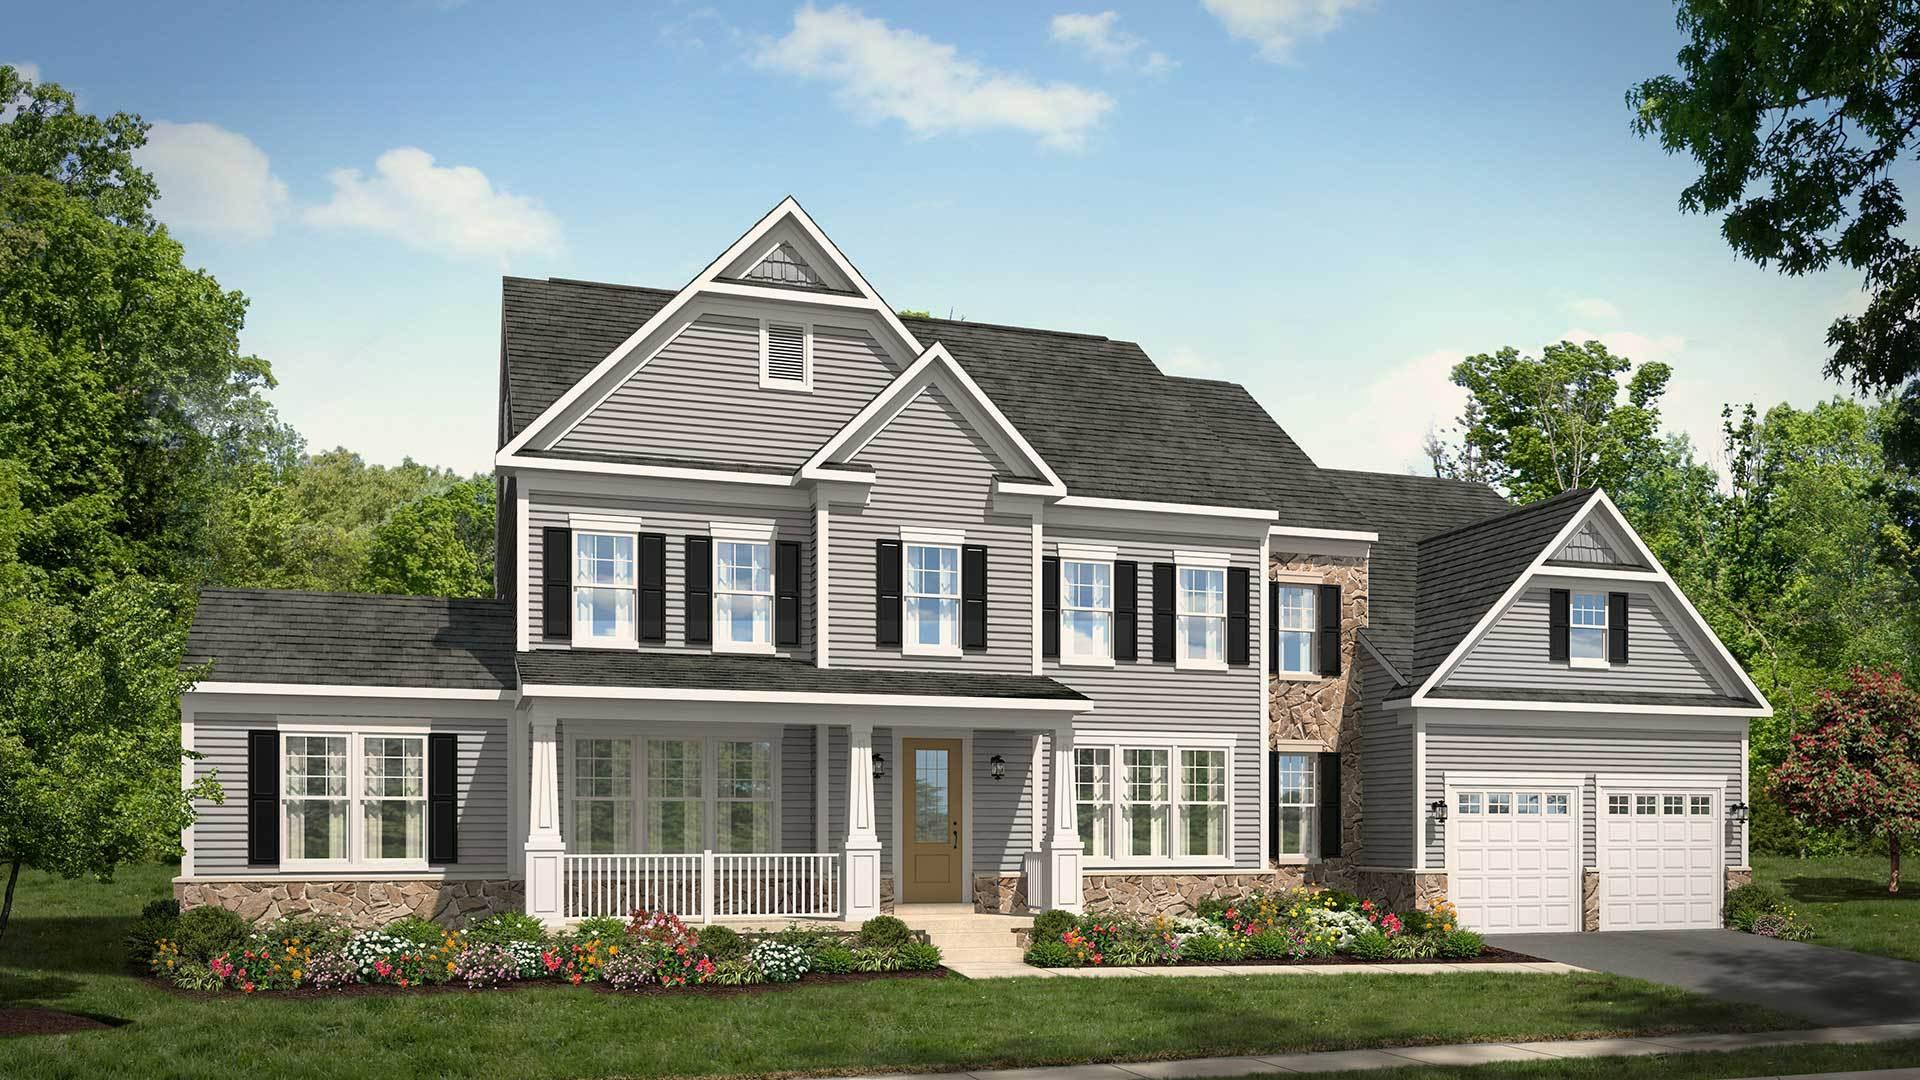 Whittington, Charlottesville, VA Homes & Land - Real Estate